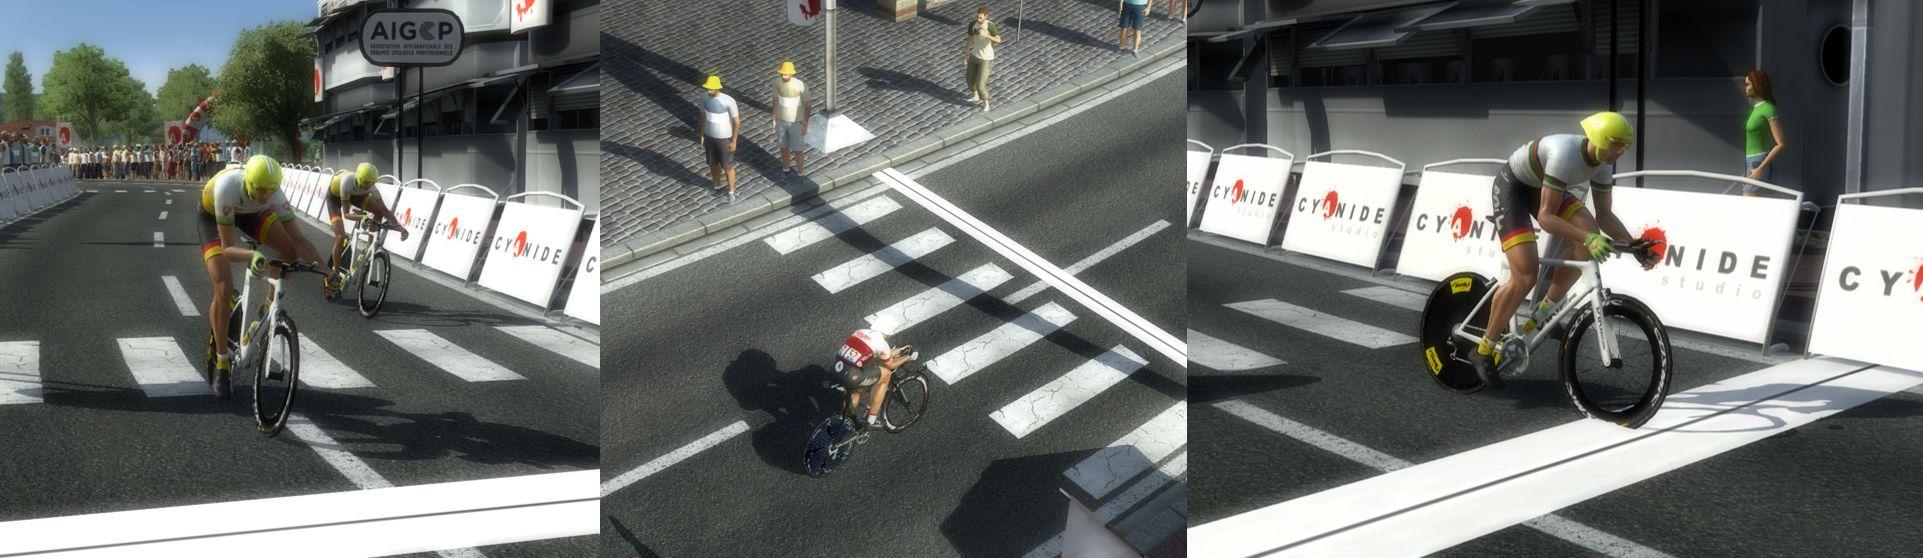 pcmdaily.com/images/mg/2019/Races/C1/Bayern/S4/mg19_bay_s04_11.jpg